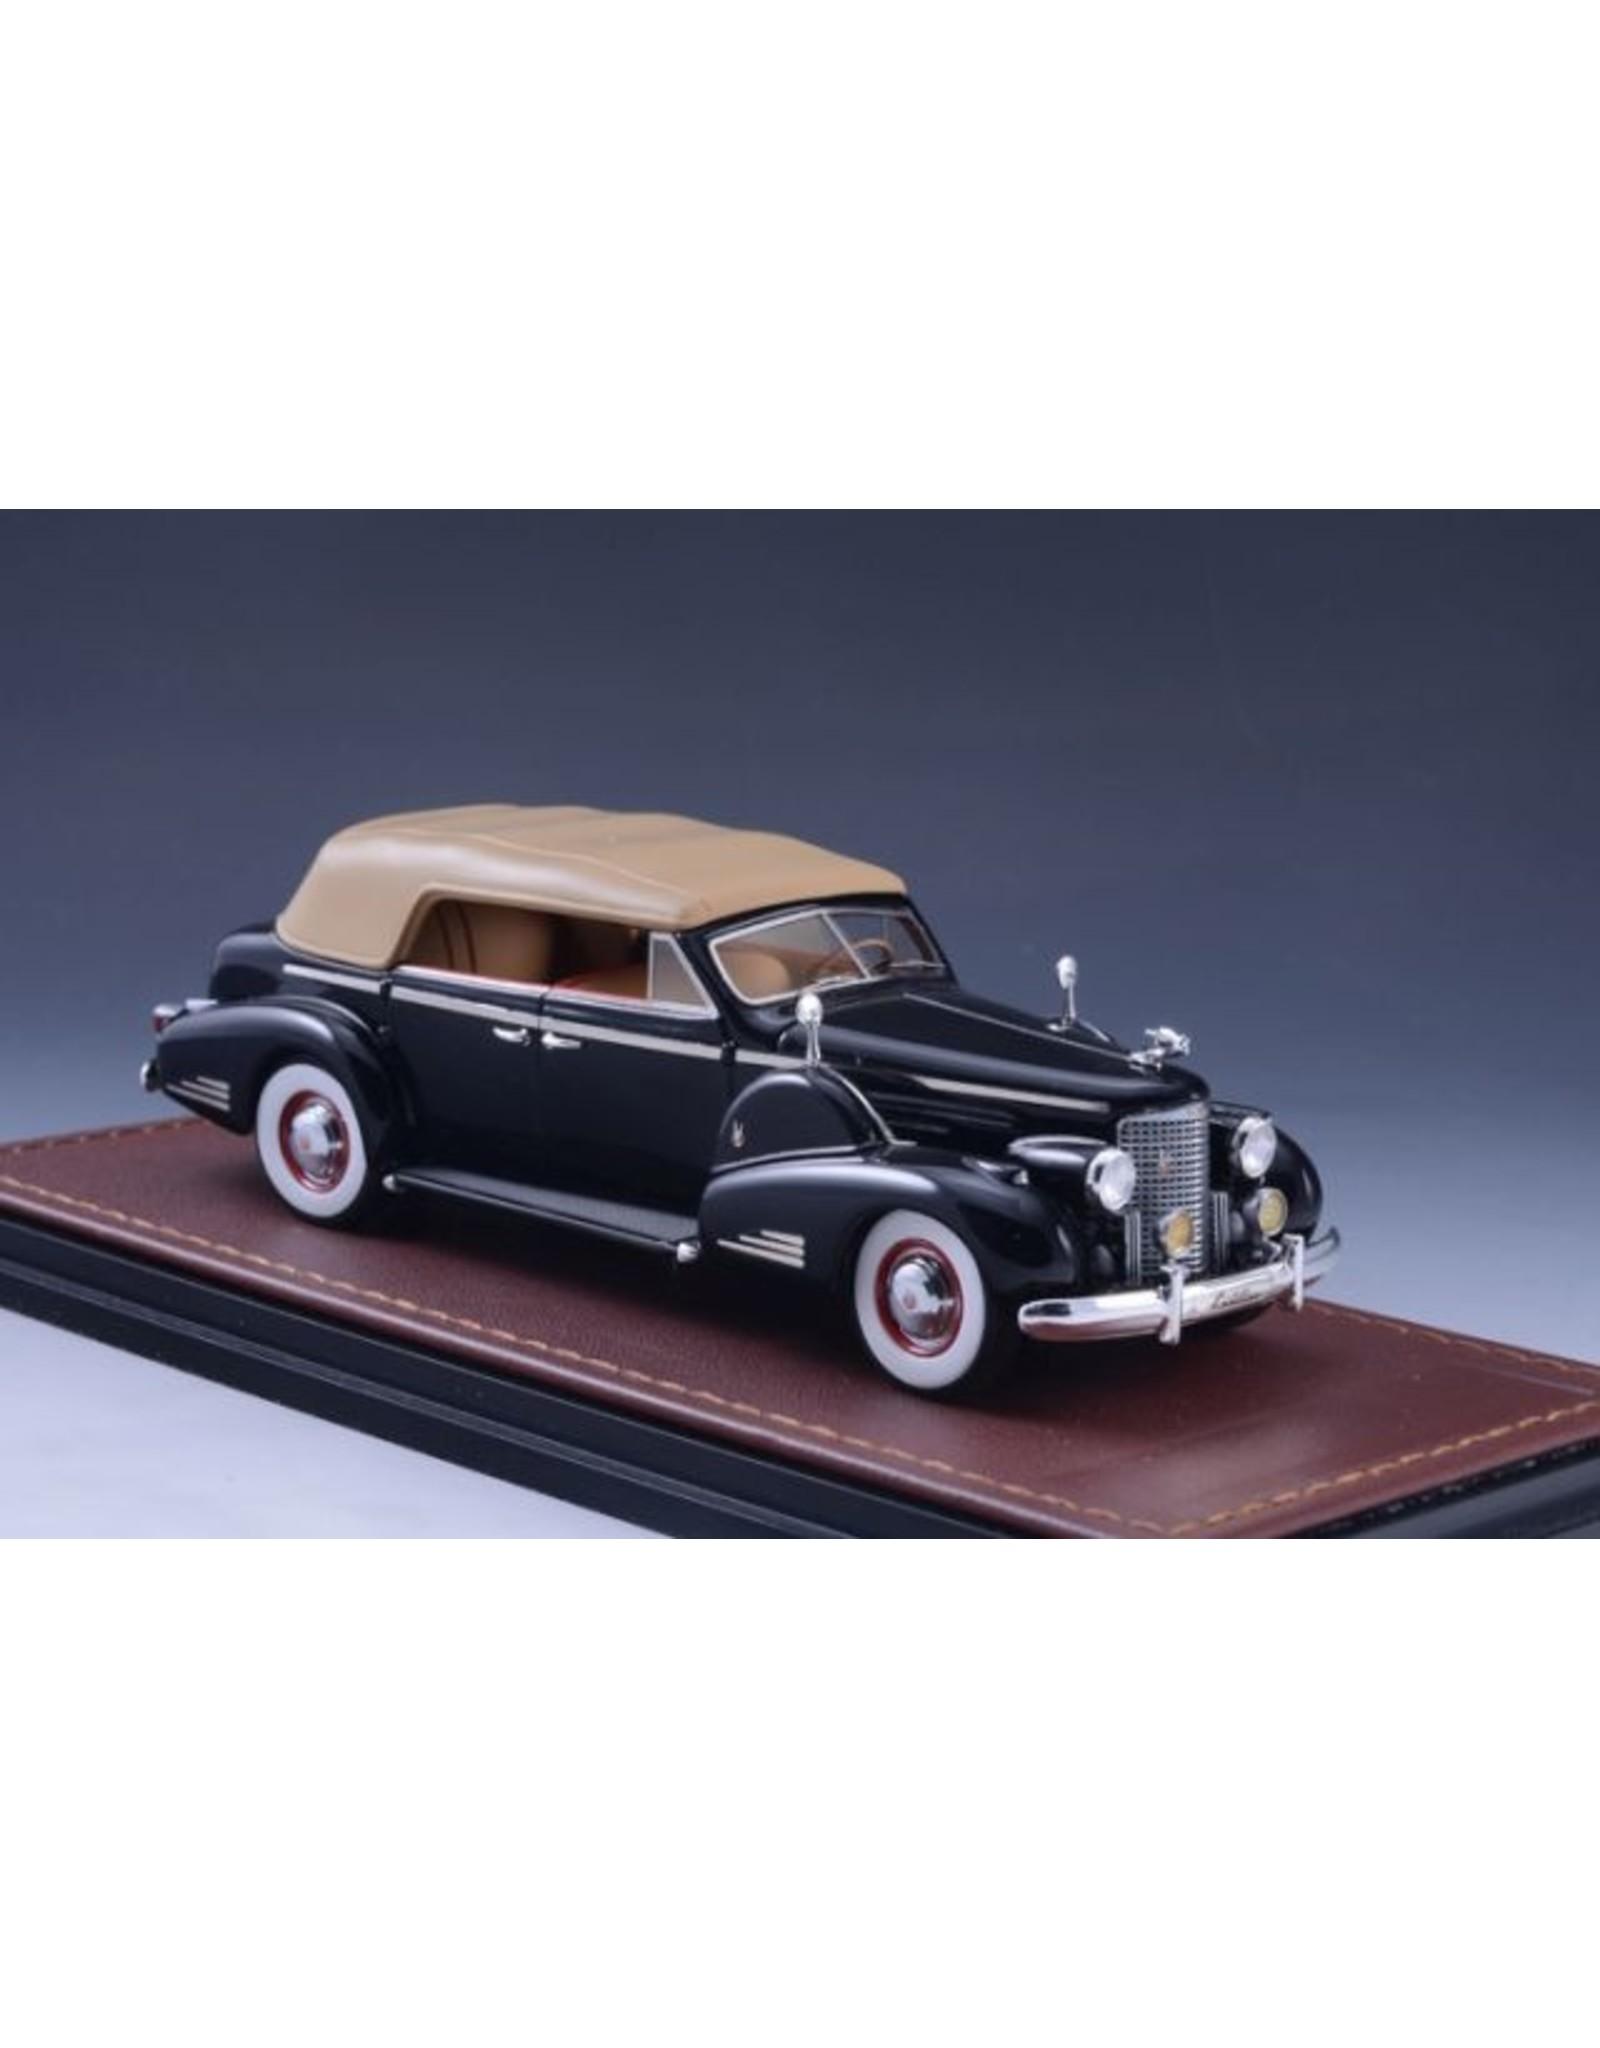 Cadillac(General Motors) CADILLAC V16 SERIES 90 FLEETWOOD SEDAN CONVERTIBLE-1938(black)closed top.